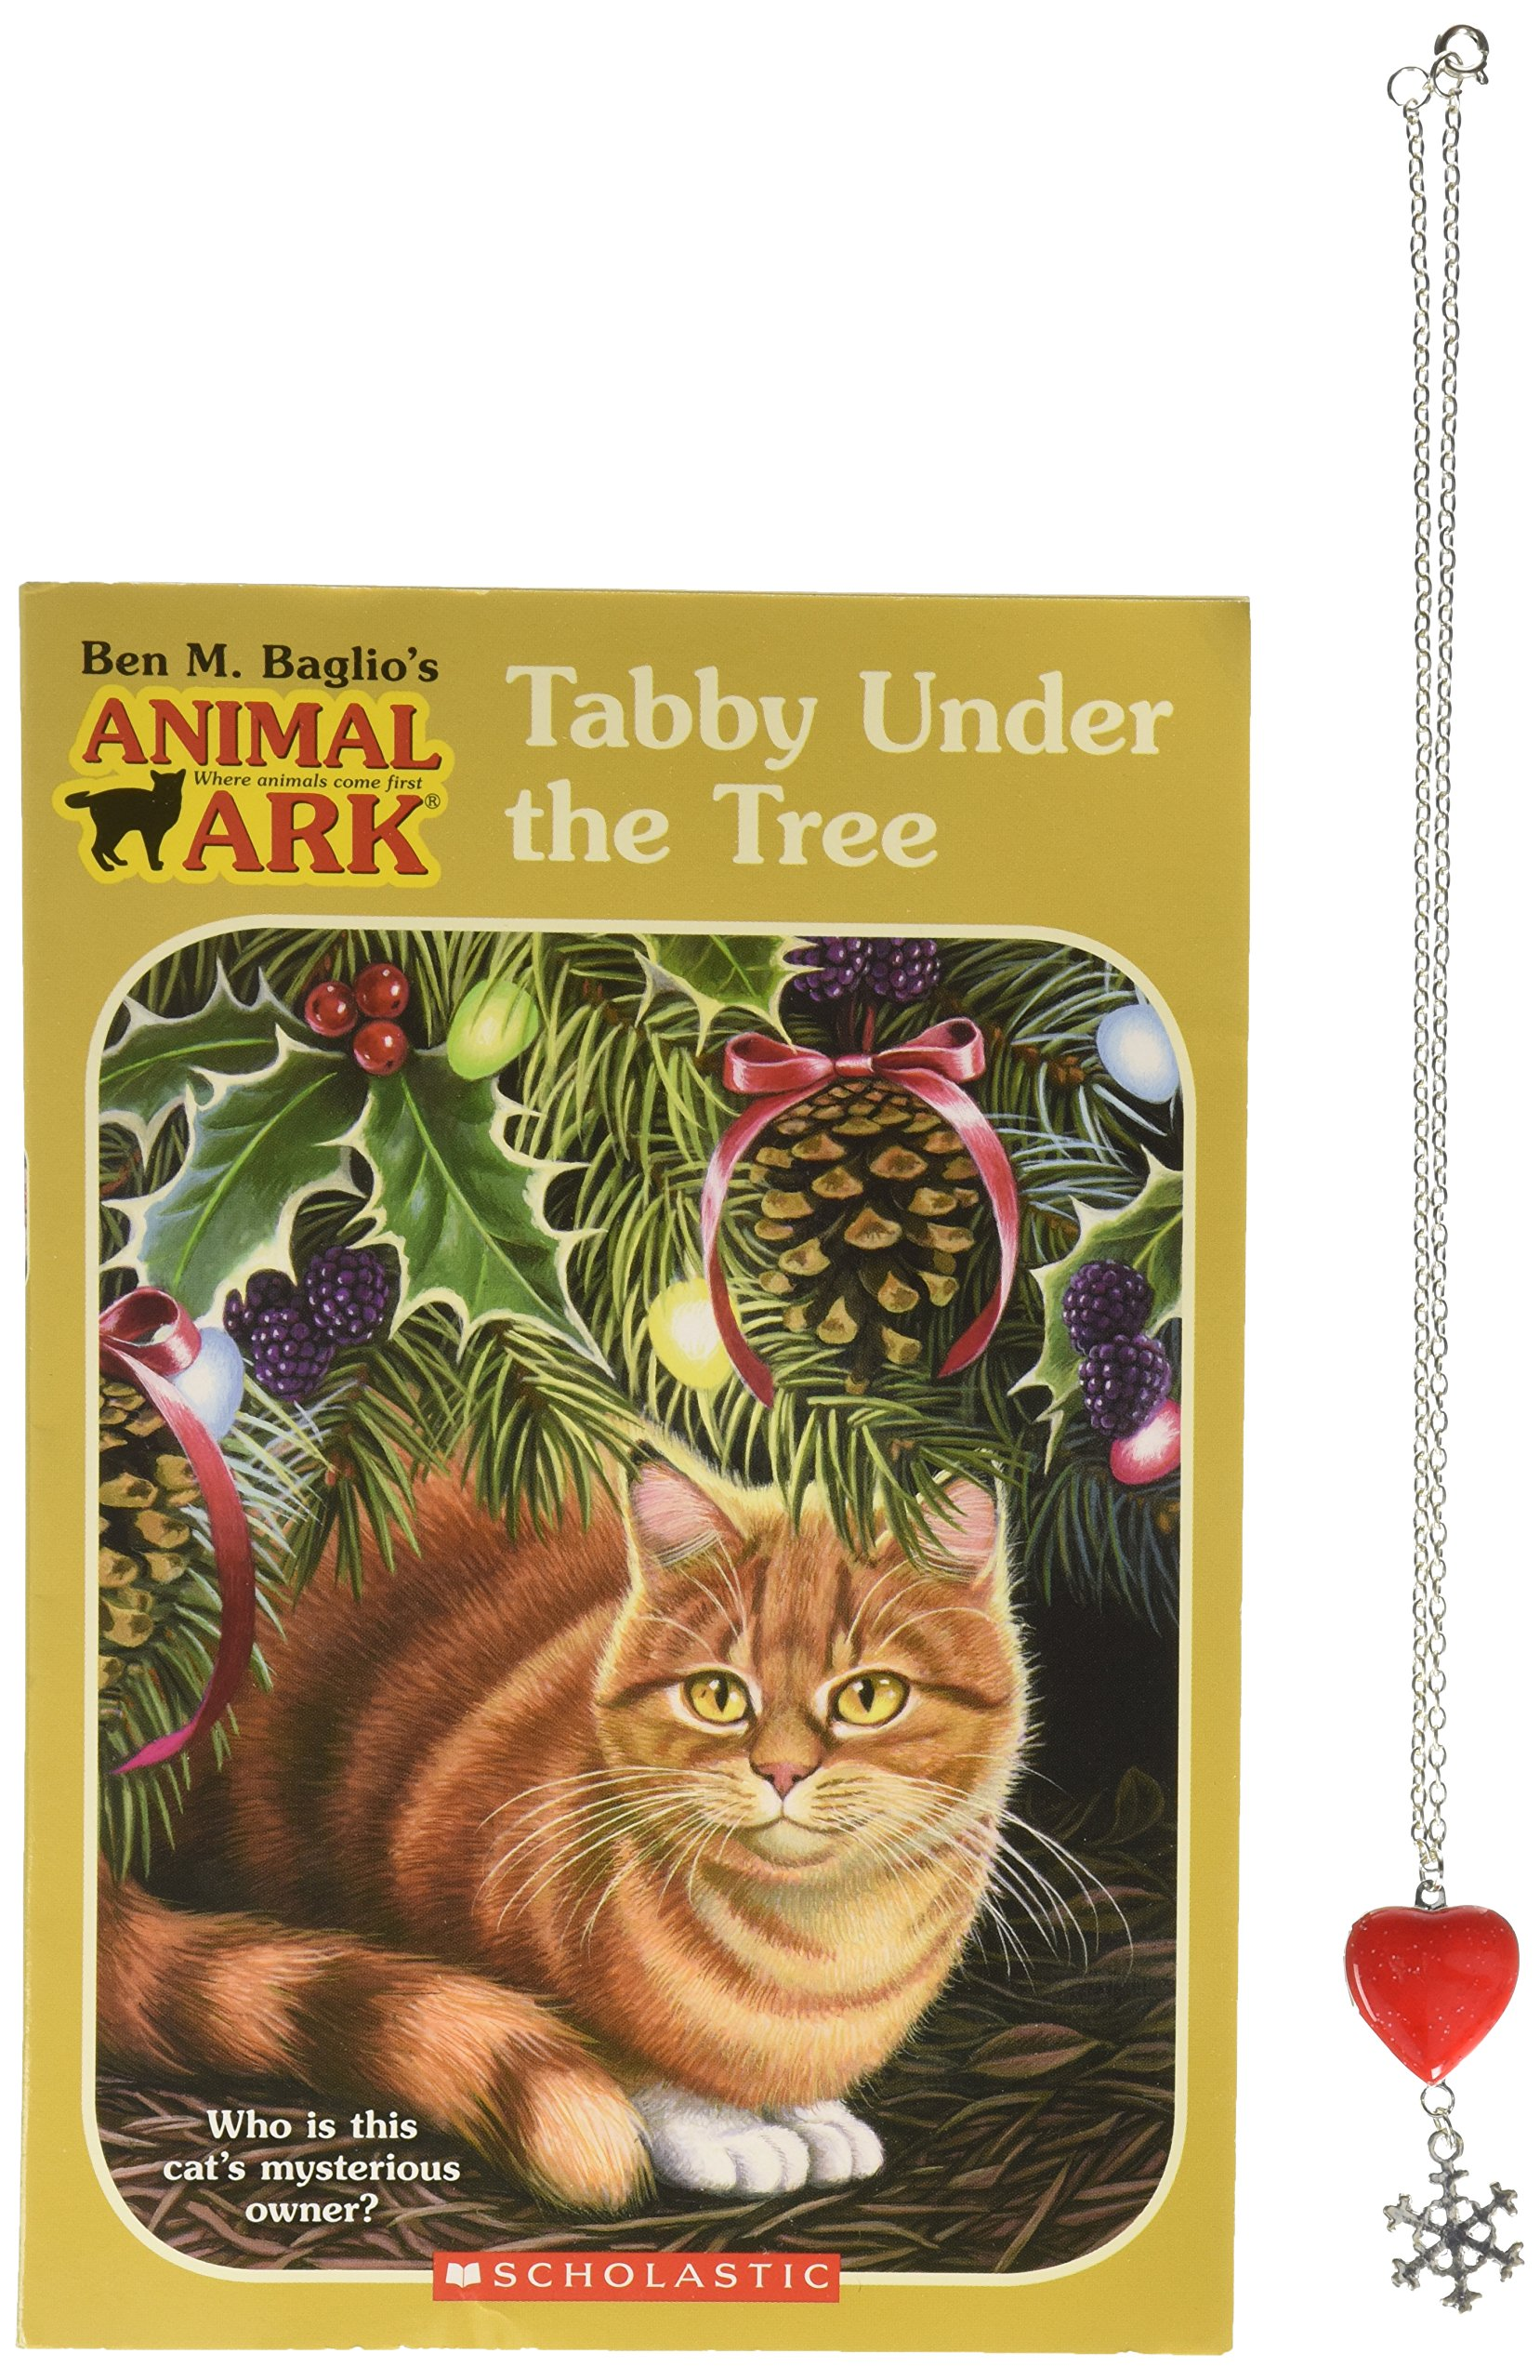 Download Tabby Under the Tree (Animal Ark Series #54) (Animal Ark Holiday Treasury #17-Christmas) PDF